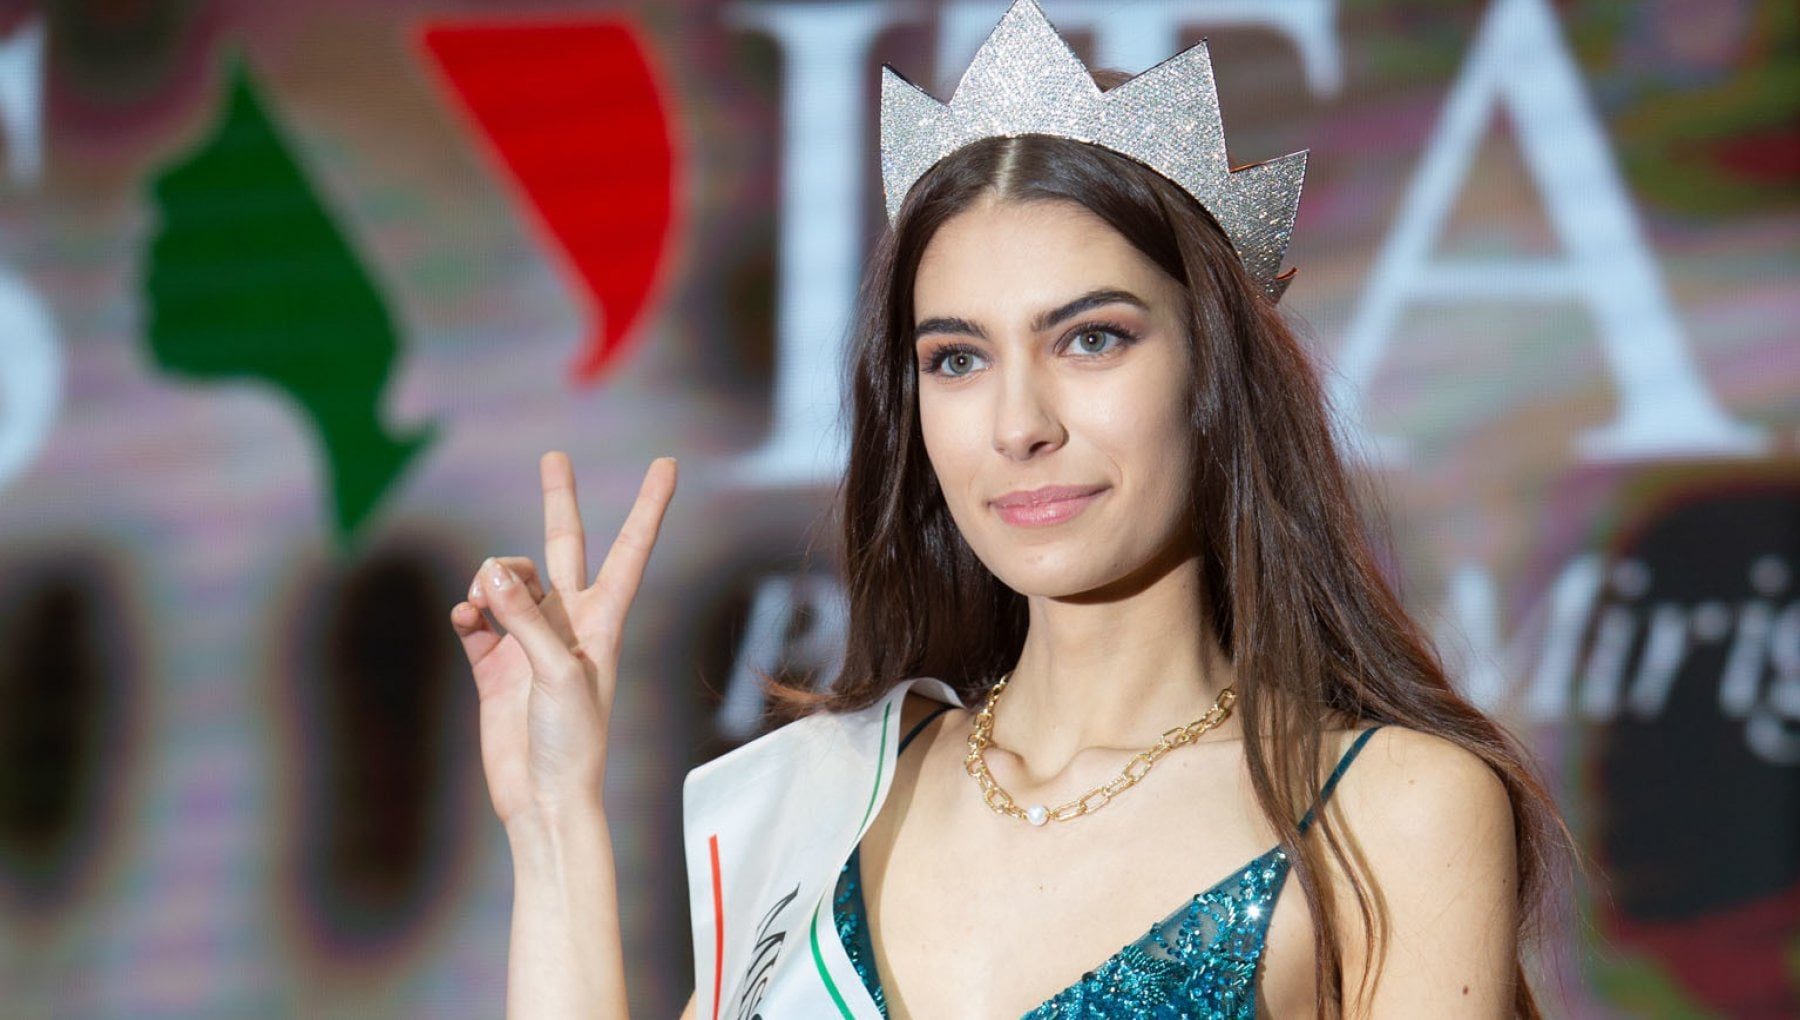 Miss Italia vince Martina Sambucini la corona torna nella Capitale dopo 27 anni